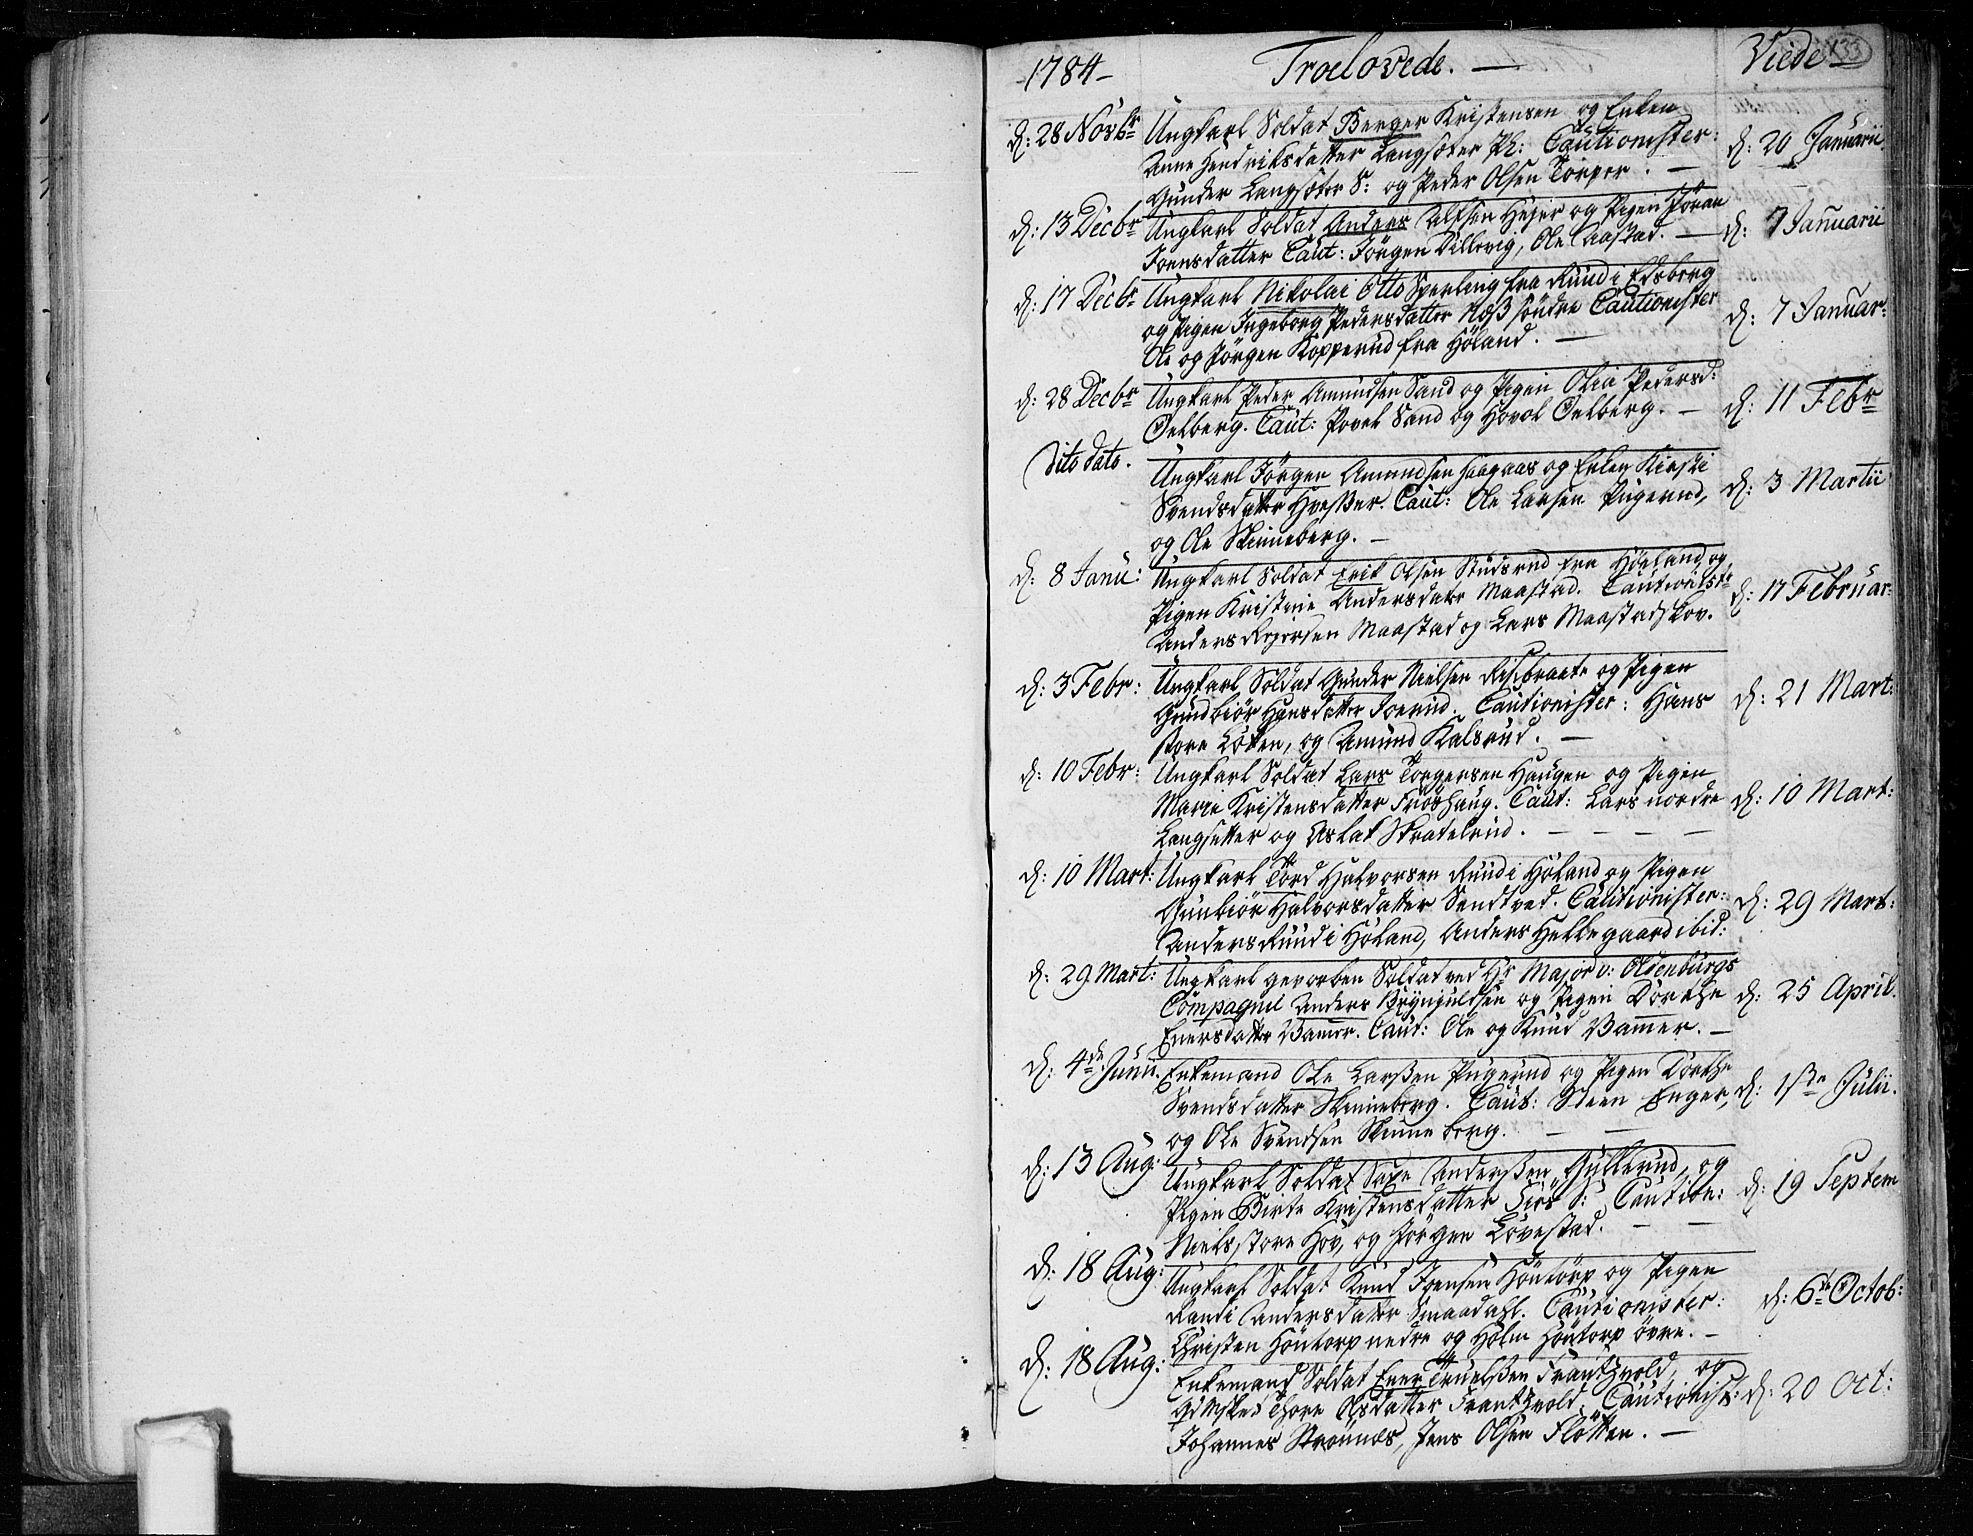 SAO, Trøgstad prestekontor Kirkebøker, F/Fa/L0005: Ministerialbok nr. I 5, 1784-1814, s. 133